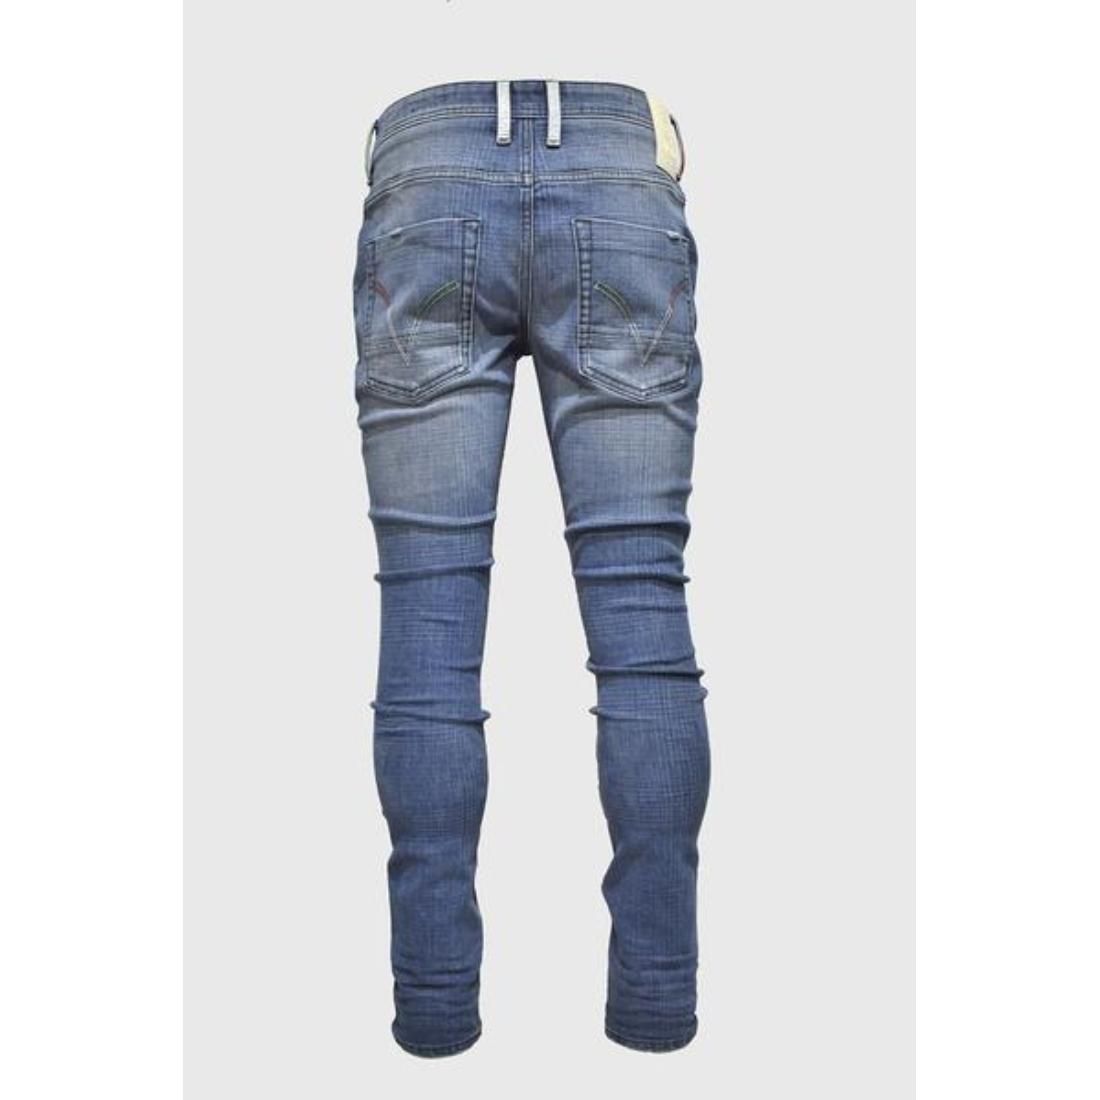 vialli spy jeans wge